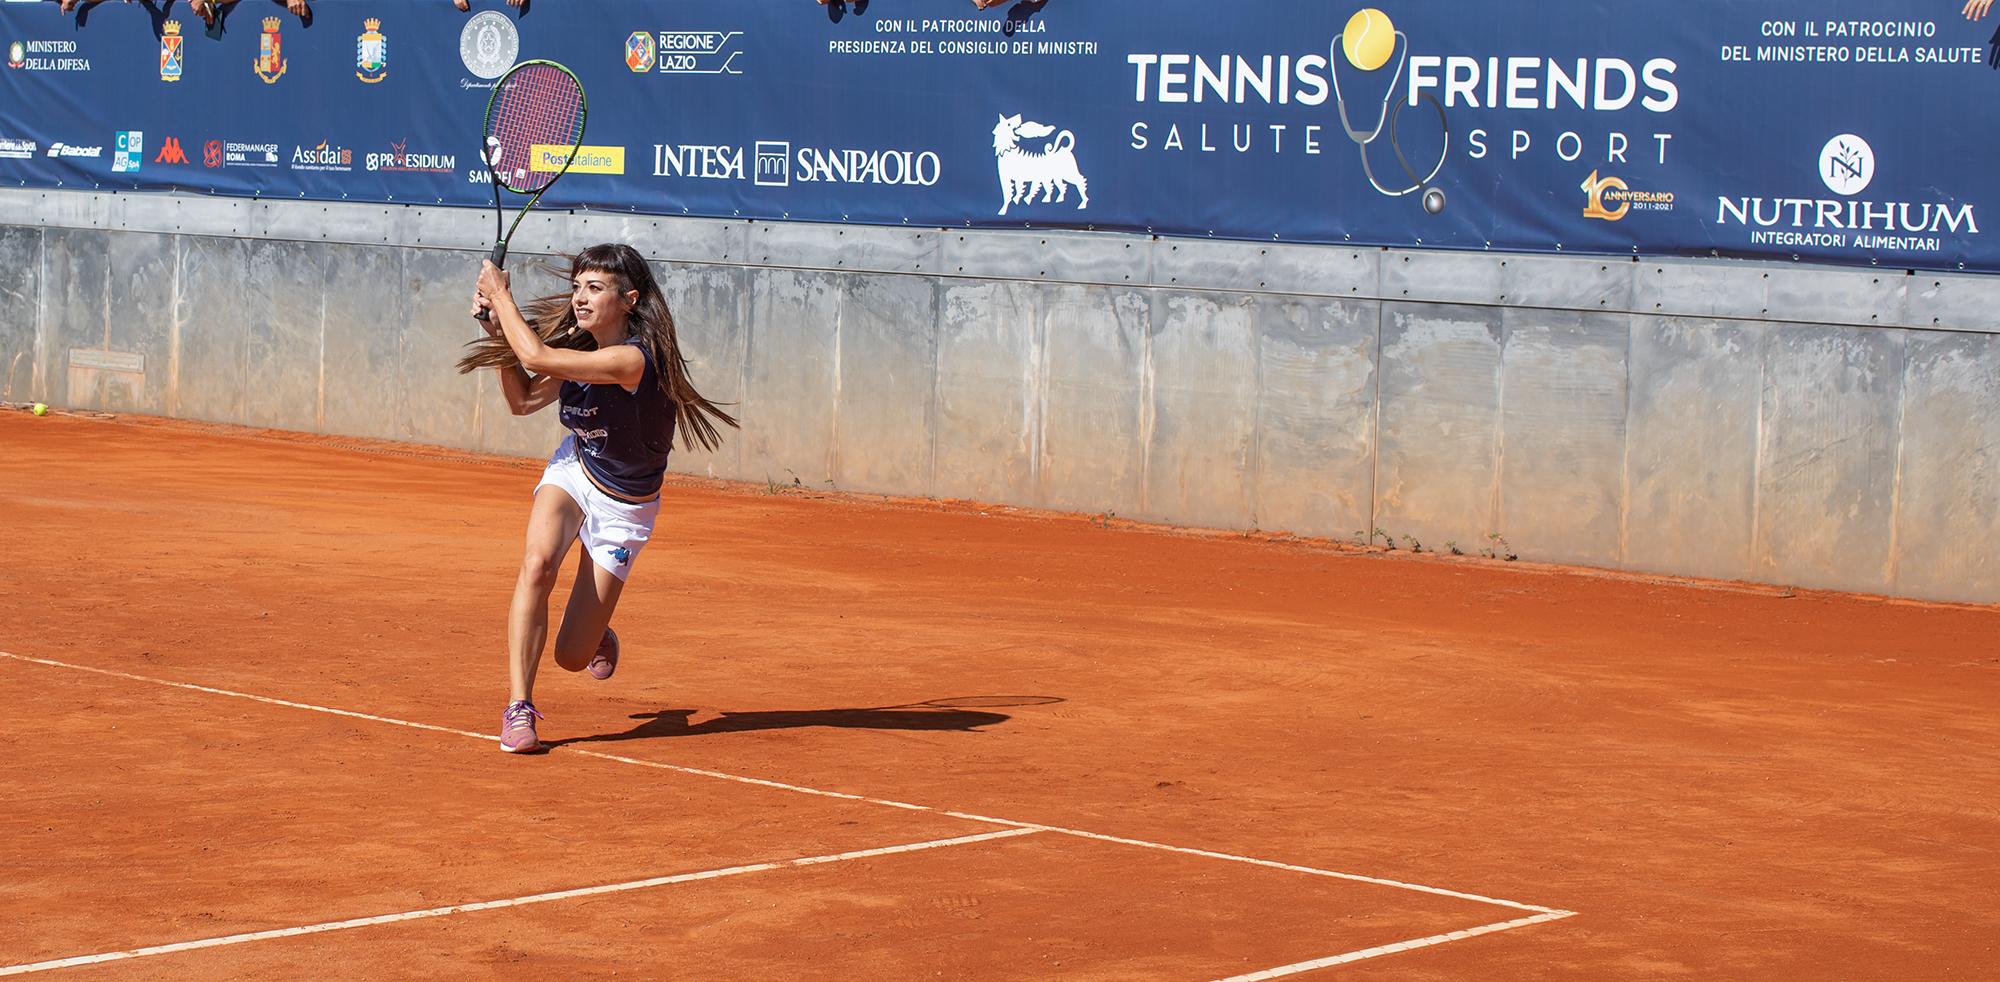 #tennisandfriends-@manudolcenera